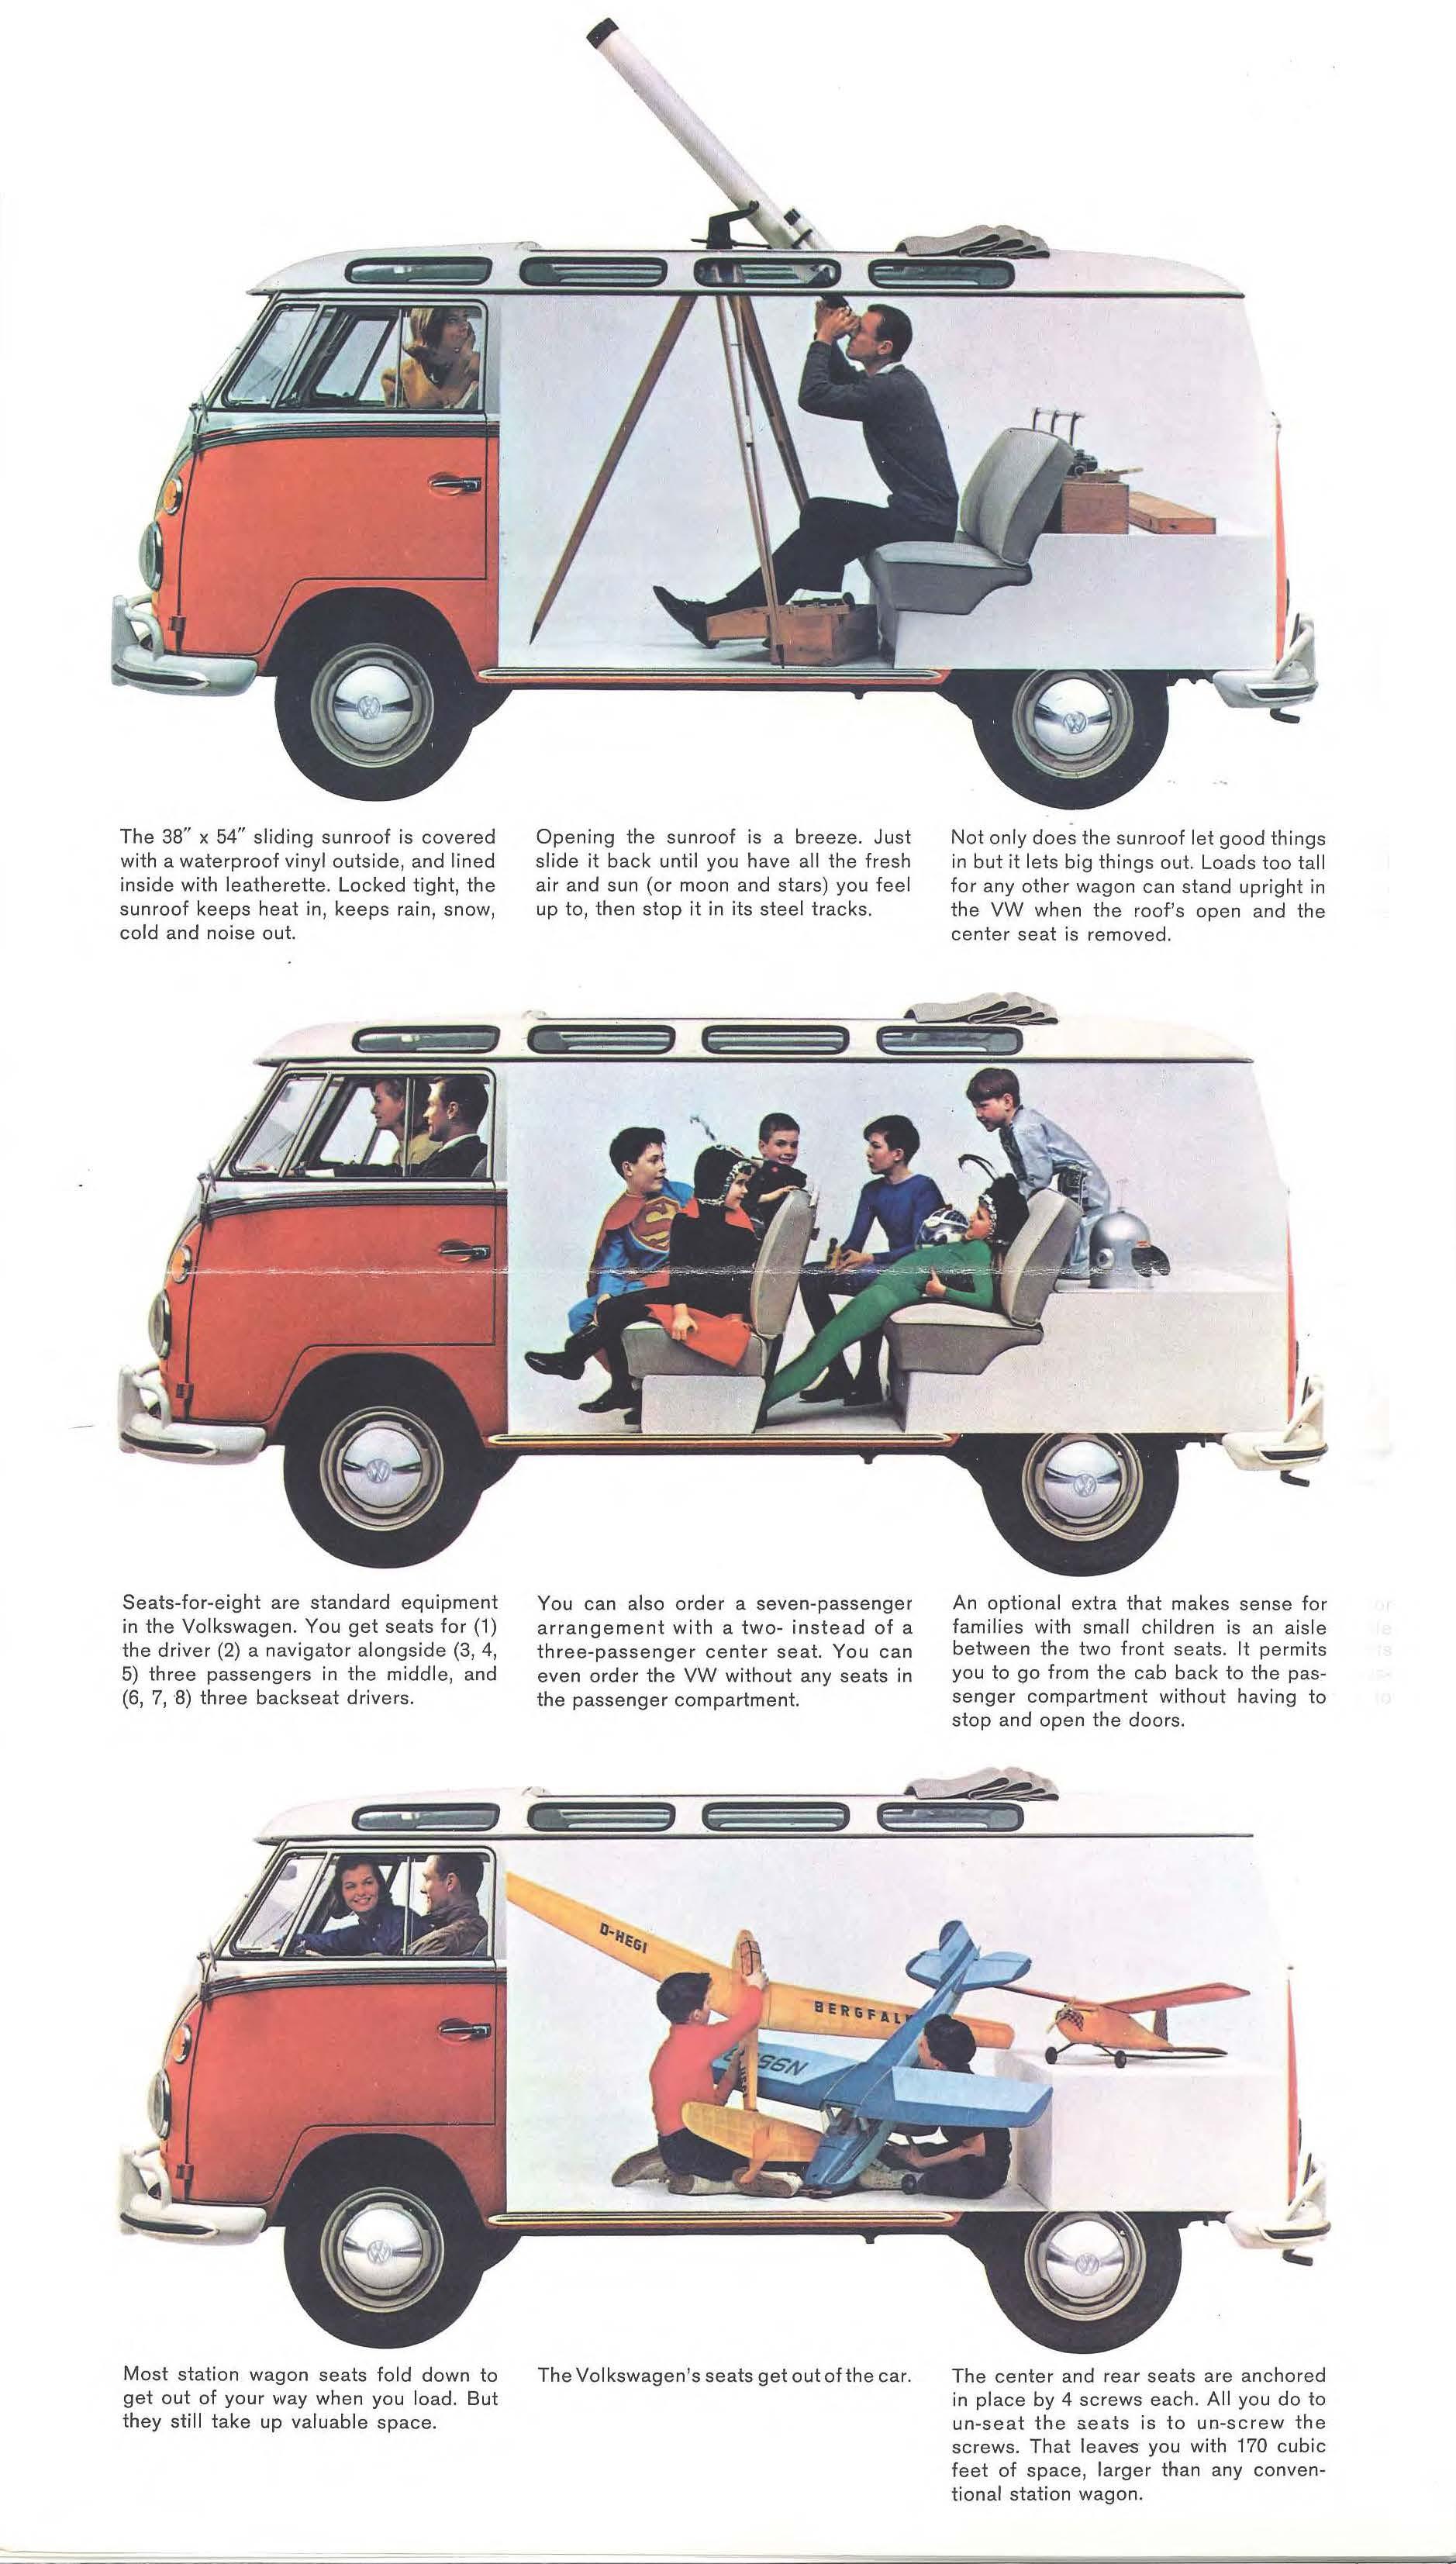 TheSamba.com :: VW Archives - 1964 VW Bus Brochure - Spacious